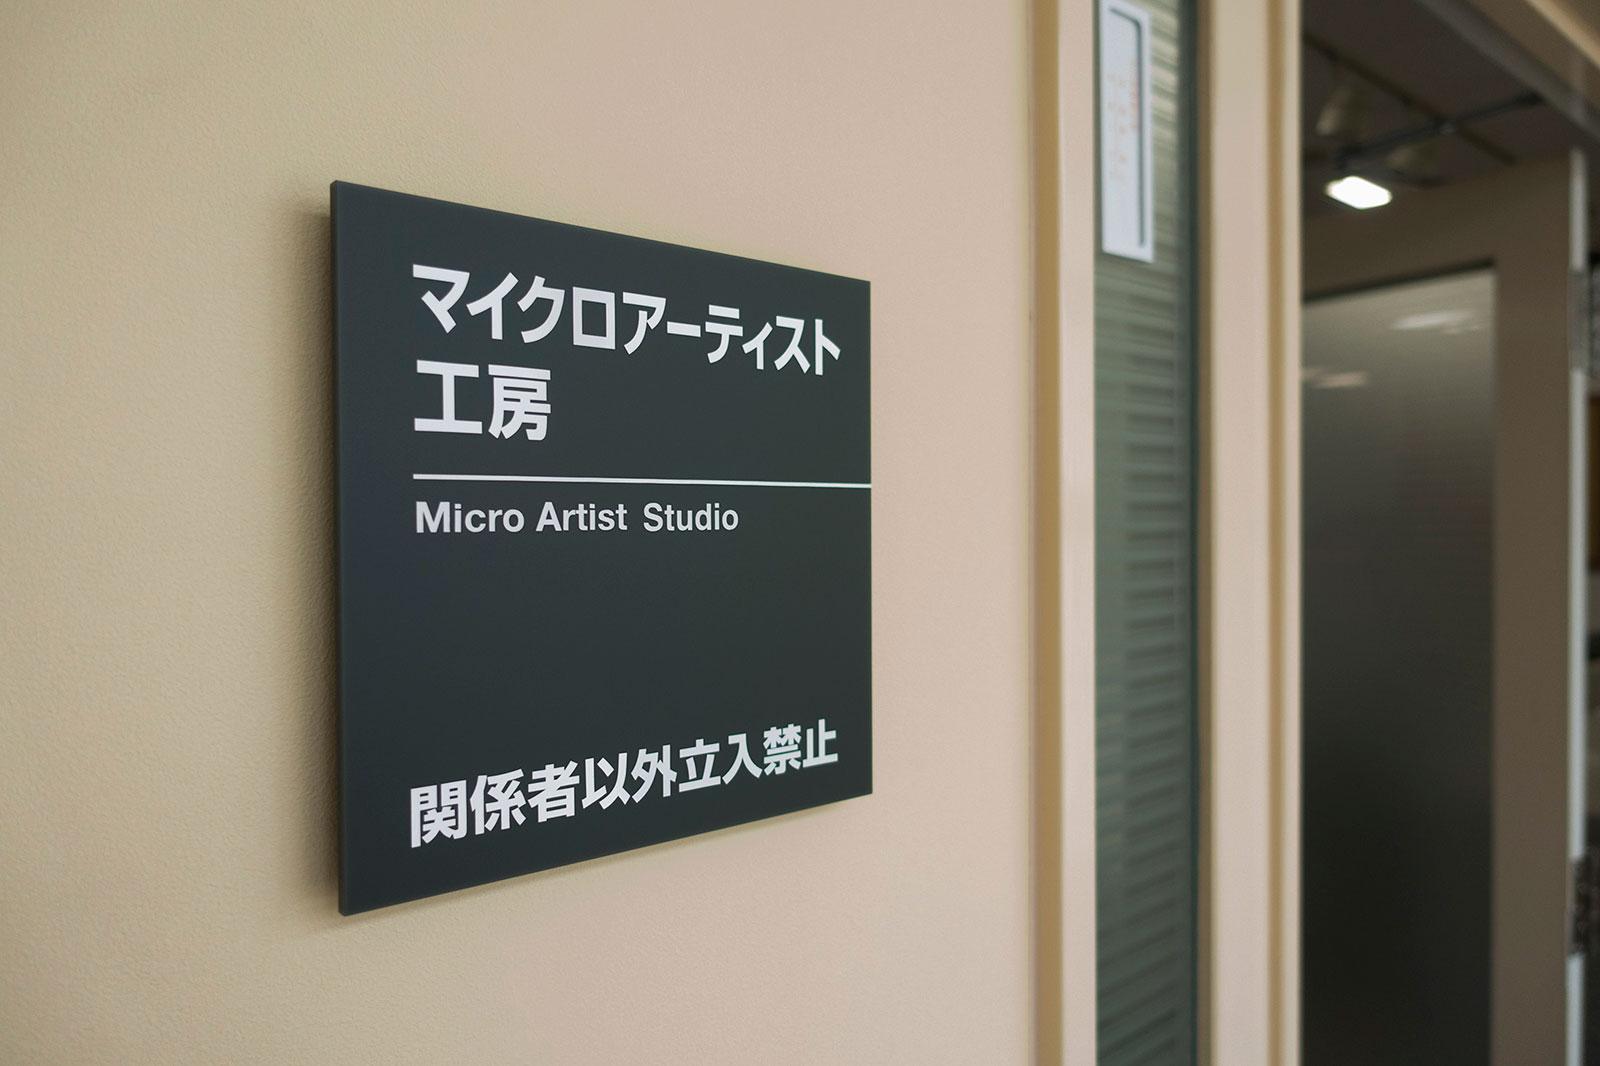 Seiko Micro Artist Studio ND Chow 14